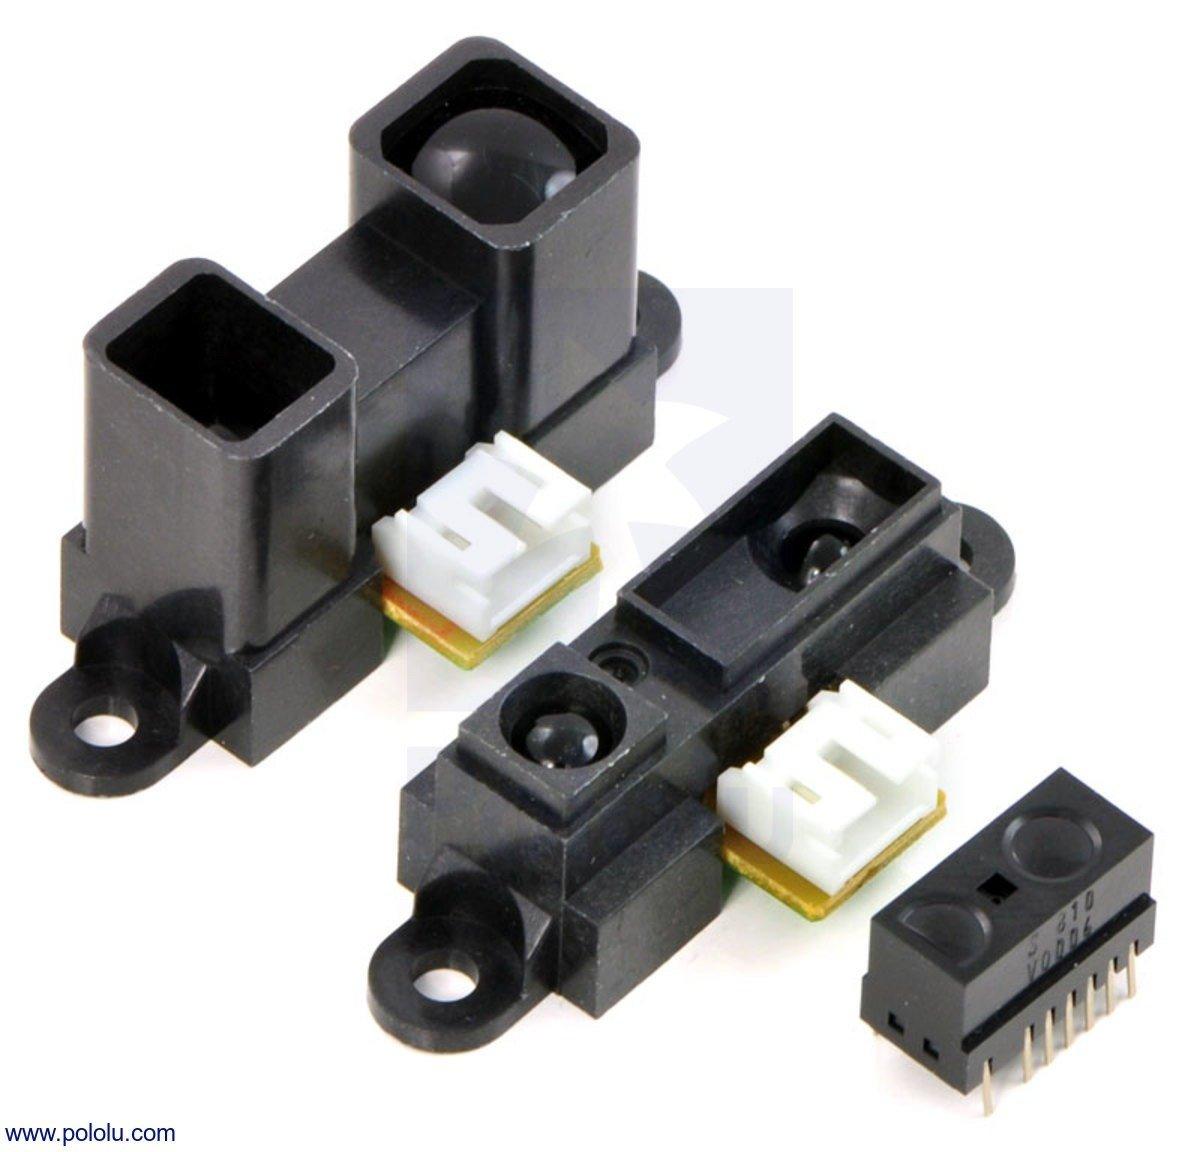 Sharp GP2Y0A02YK0F Analog Distance Sensor 20-150cm